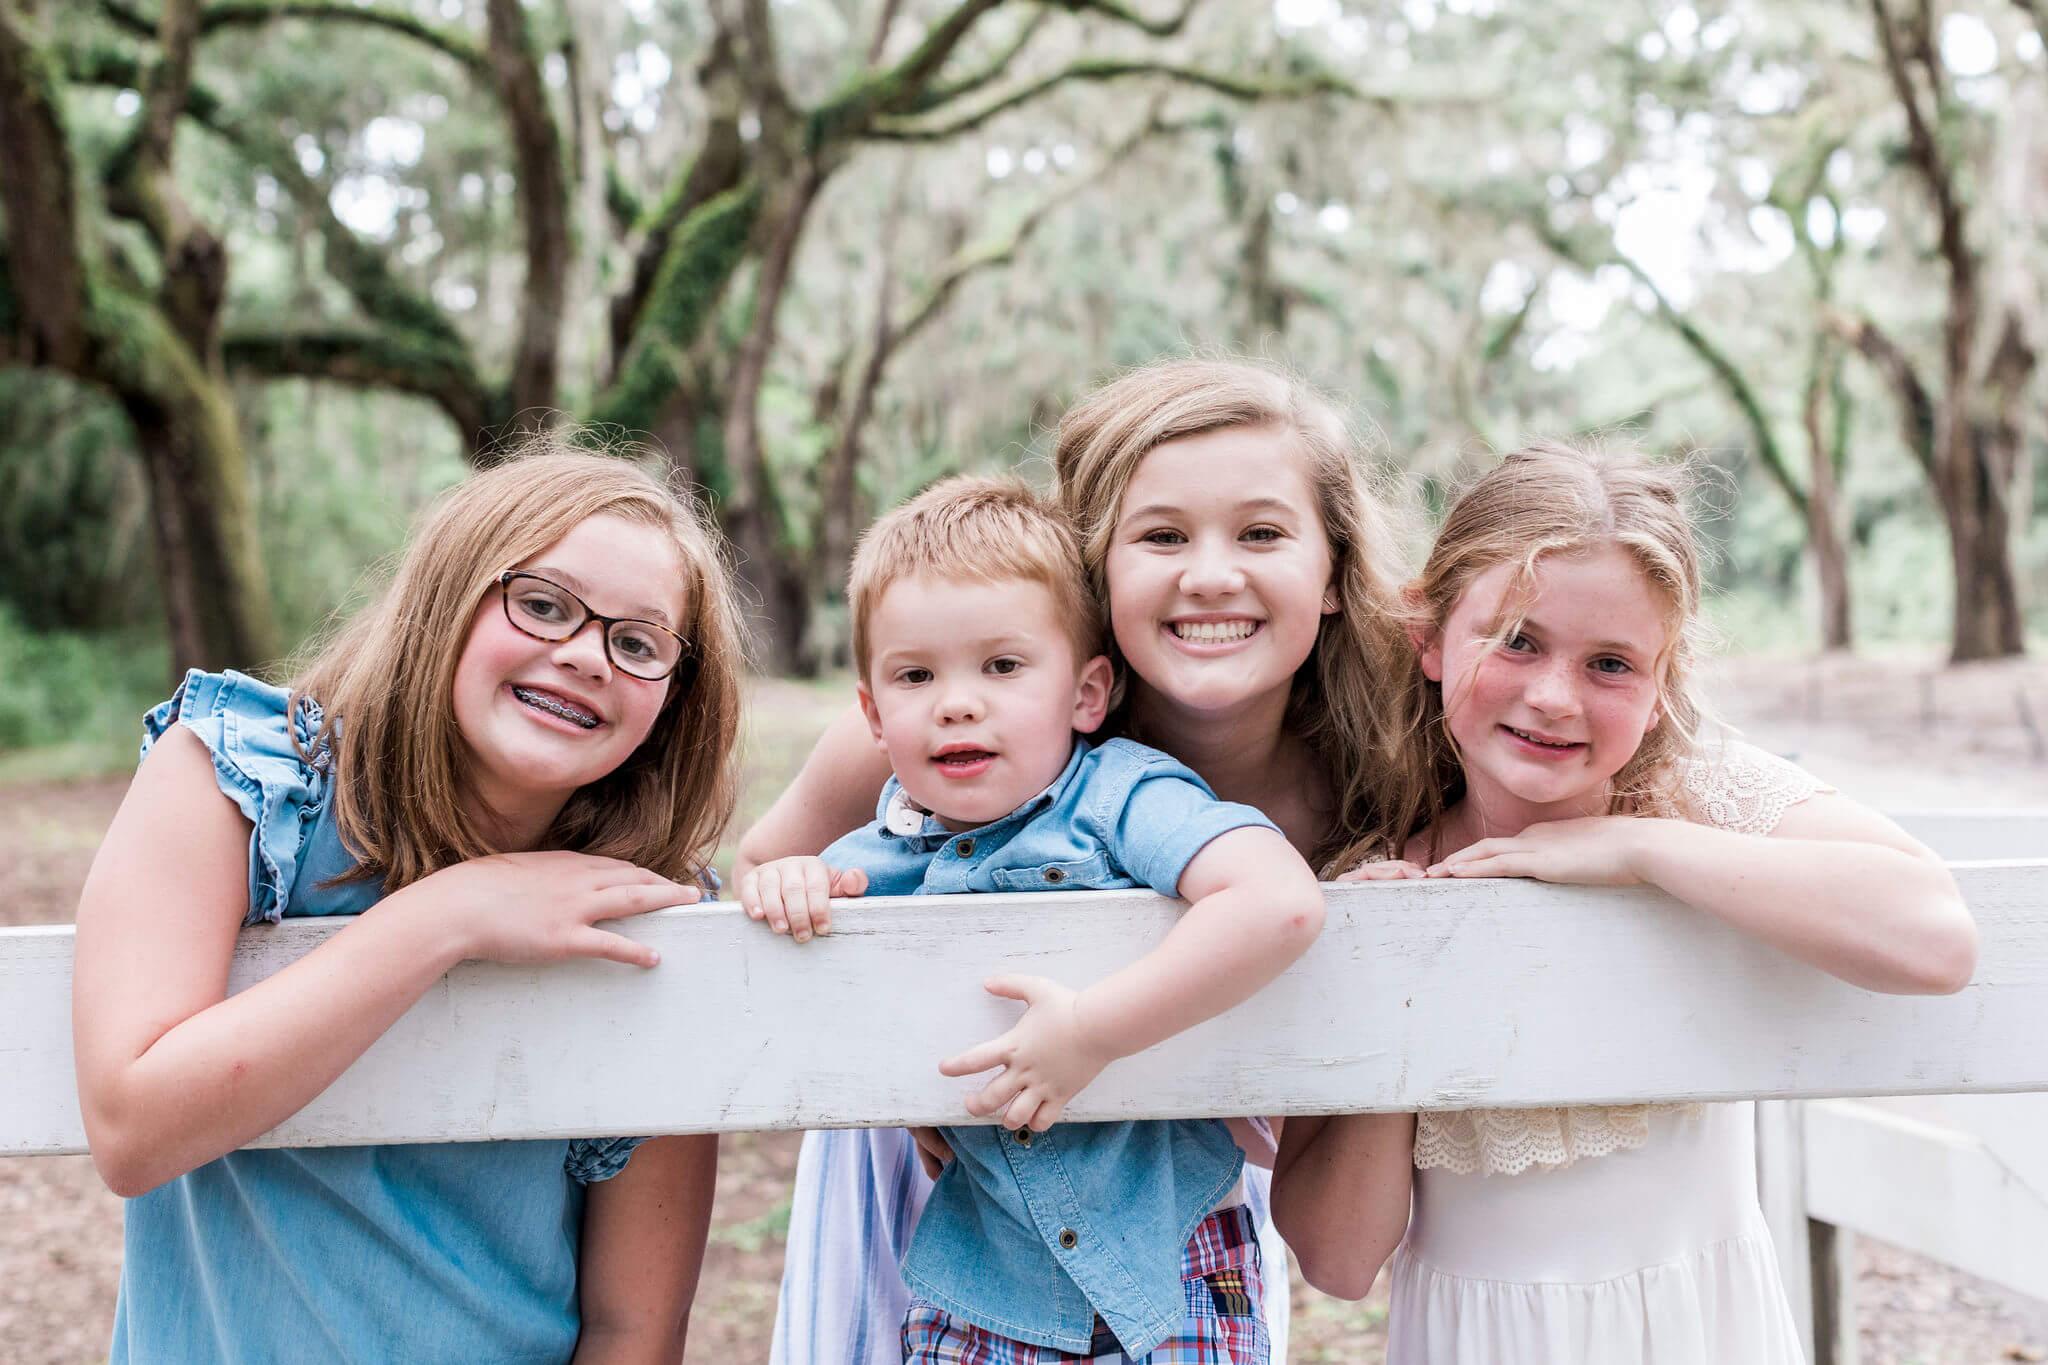 Apt-b-photography-savannah-engagement-photographer-savannah-family-kid-hilton-head-elopement-savannah-wedding-photographer-9.jpg